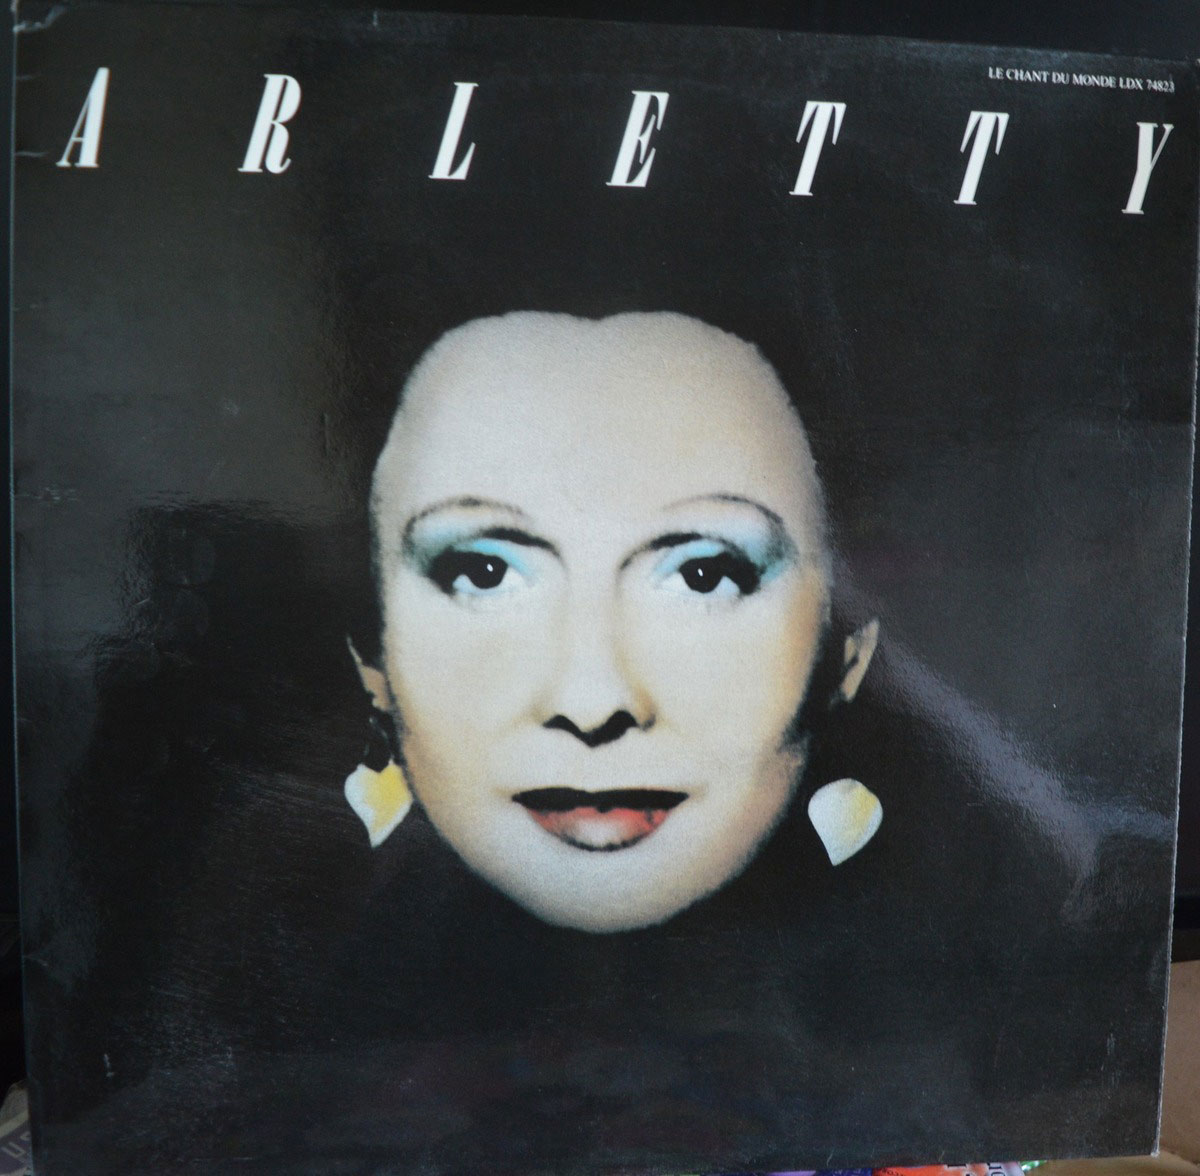 Arletty Arletty Lp Buy From Vinylnet